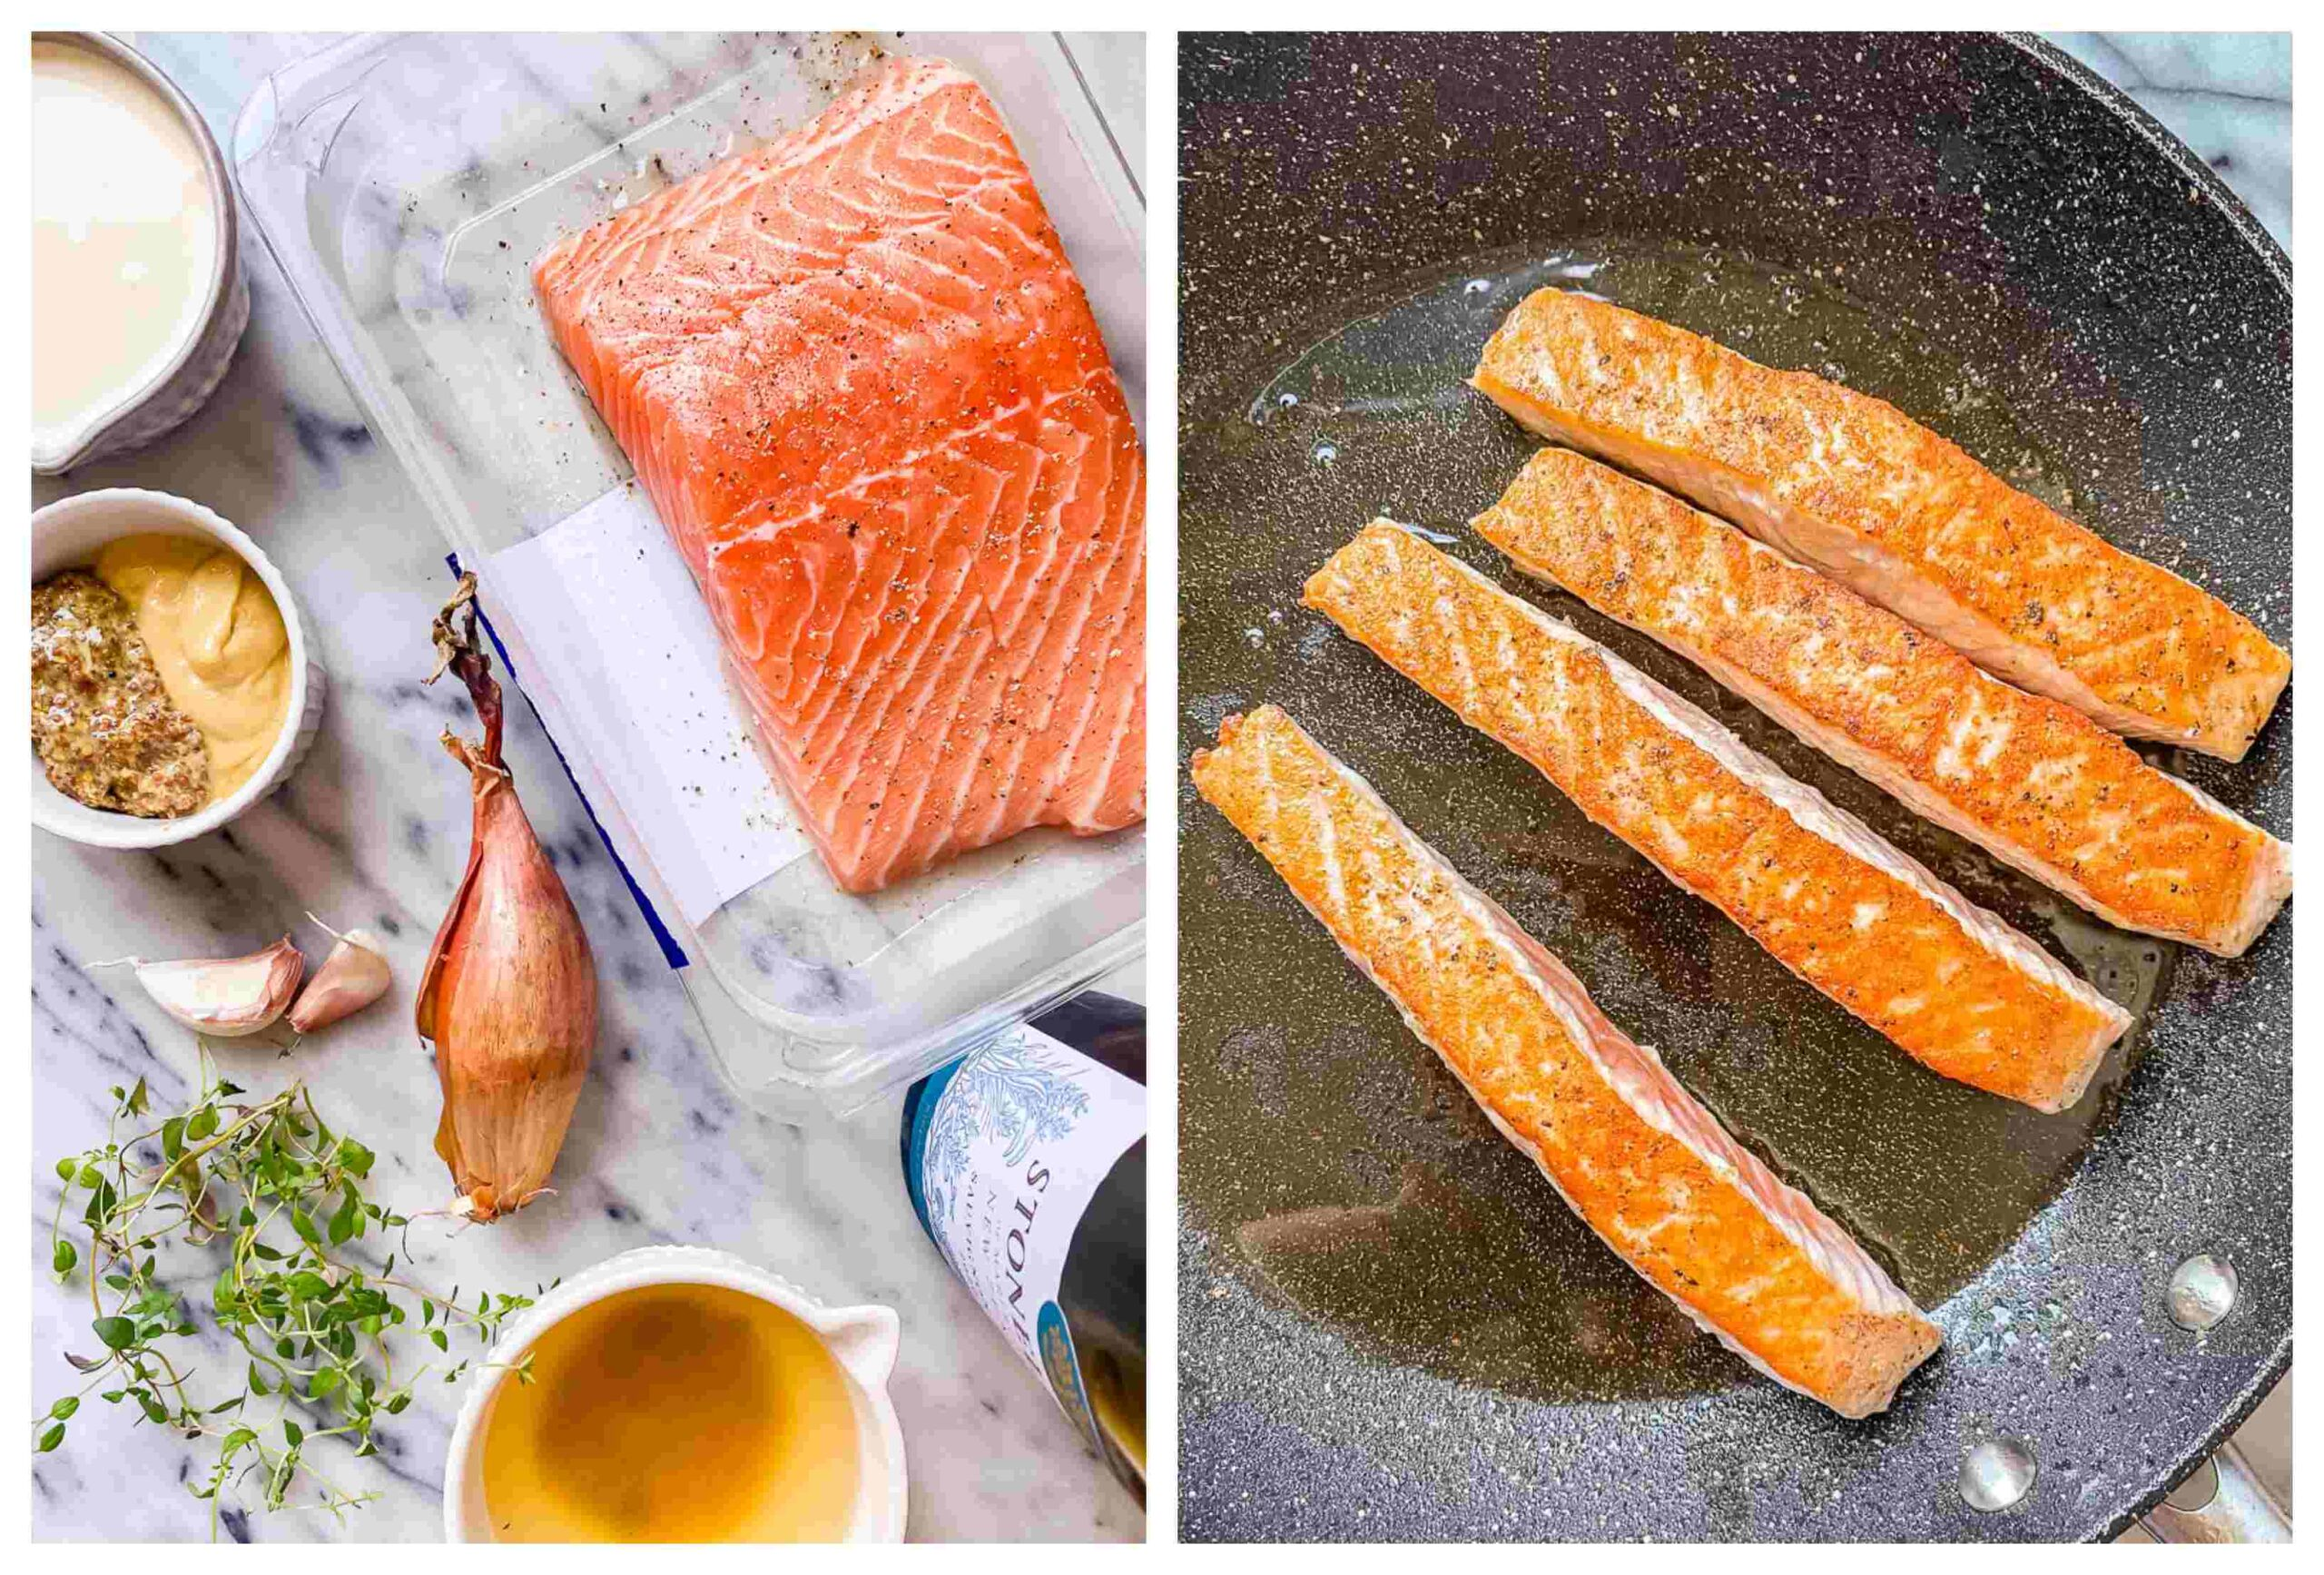 pan seared salmon recipe process images